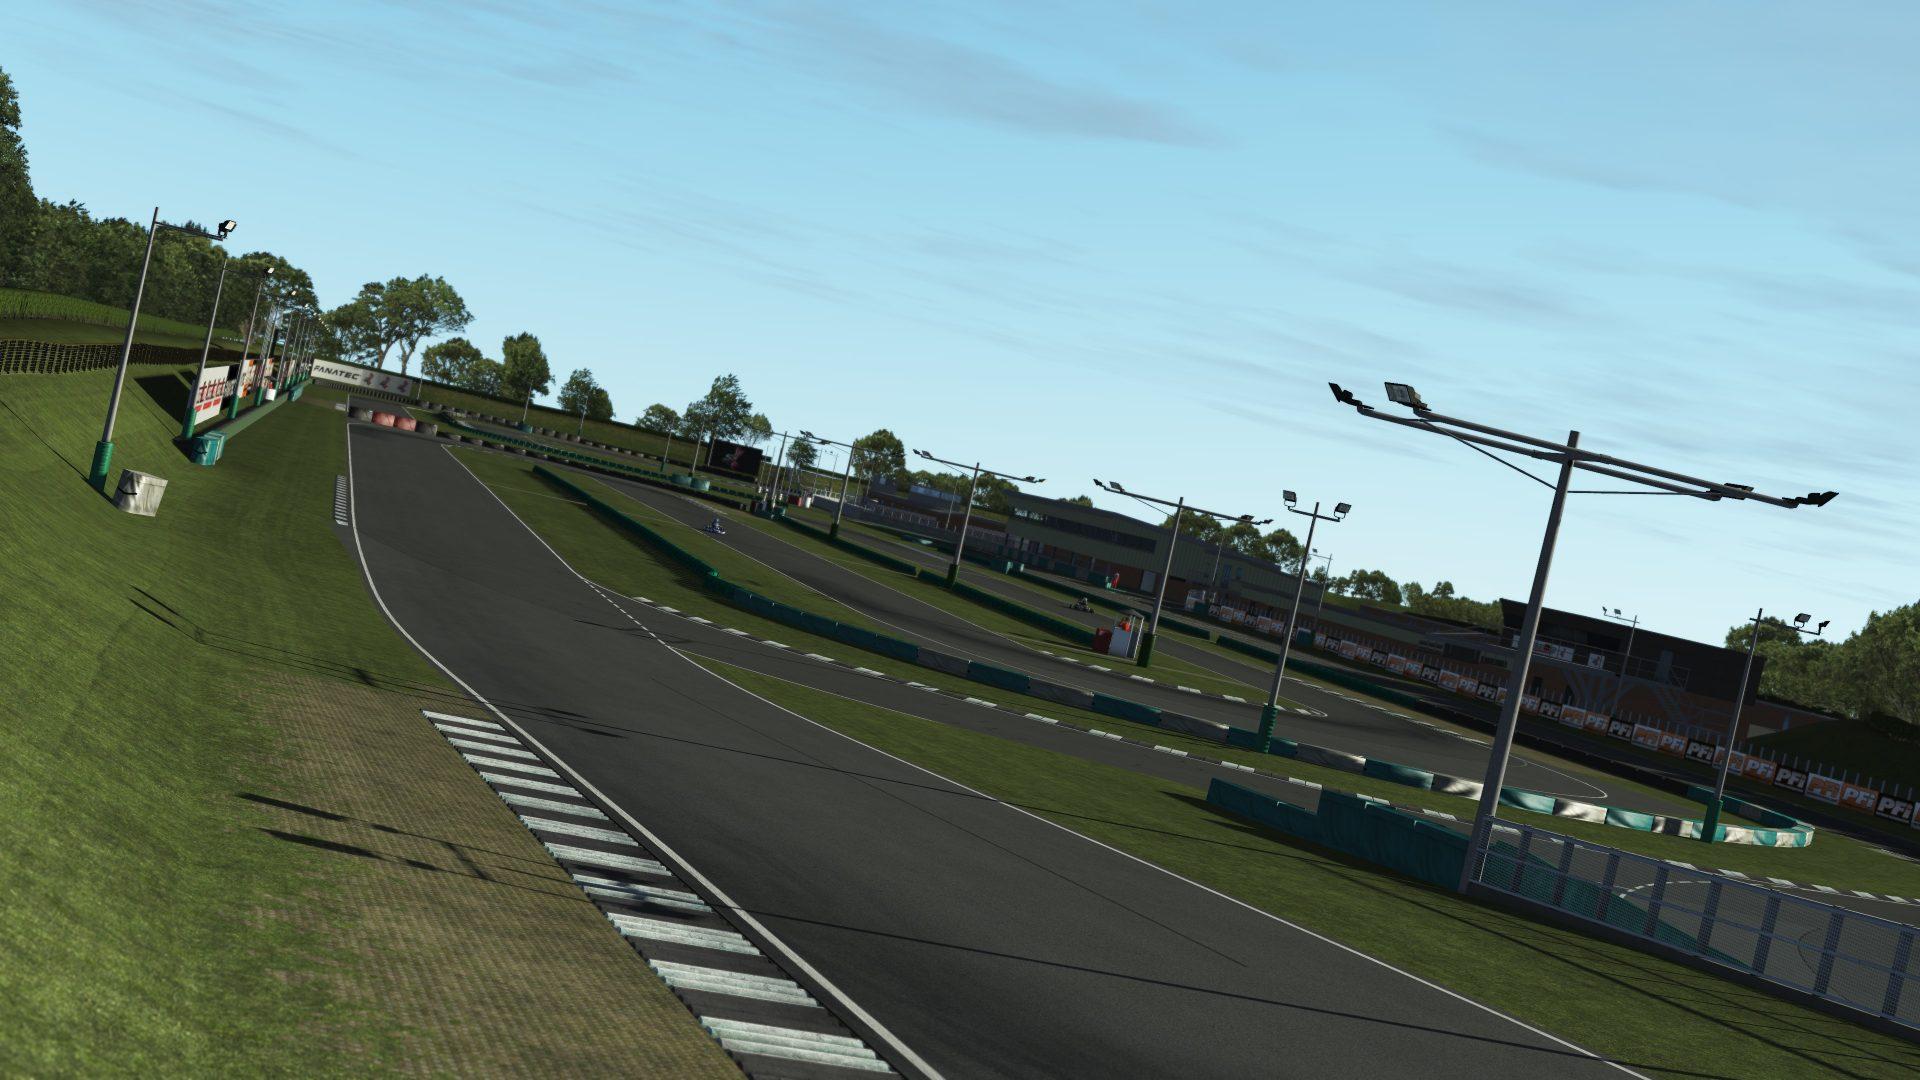 rFactor 2 KartSim track preview